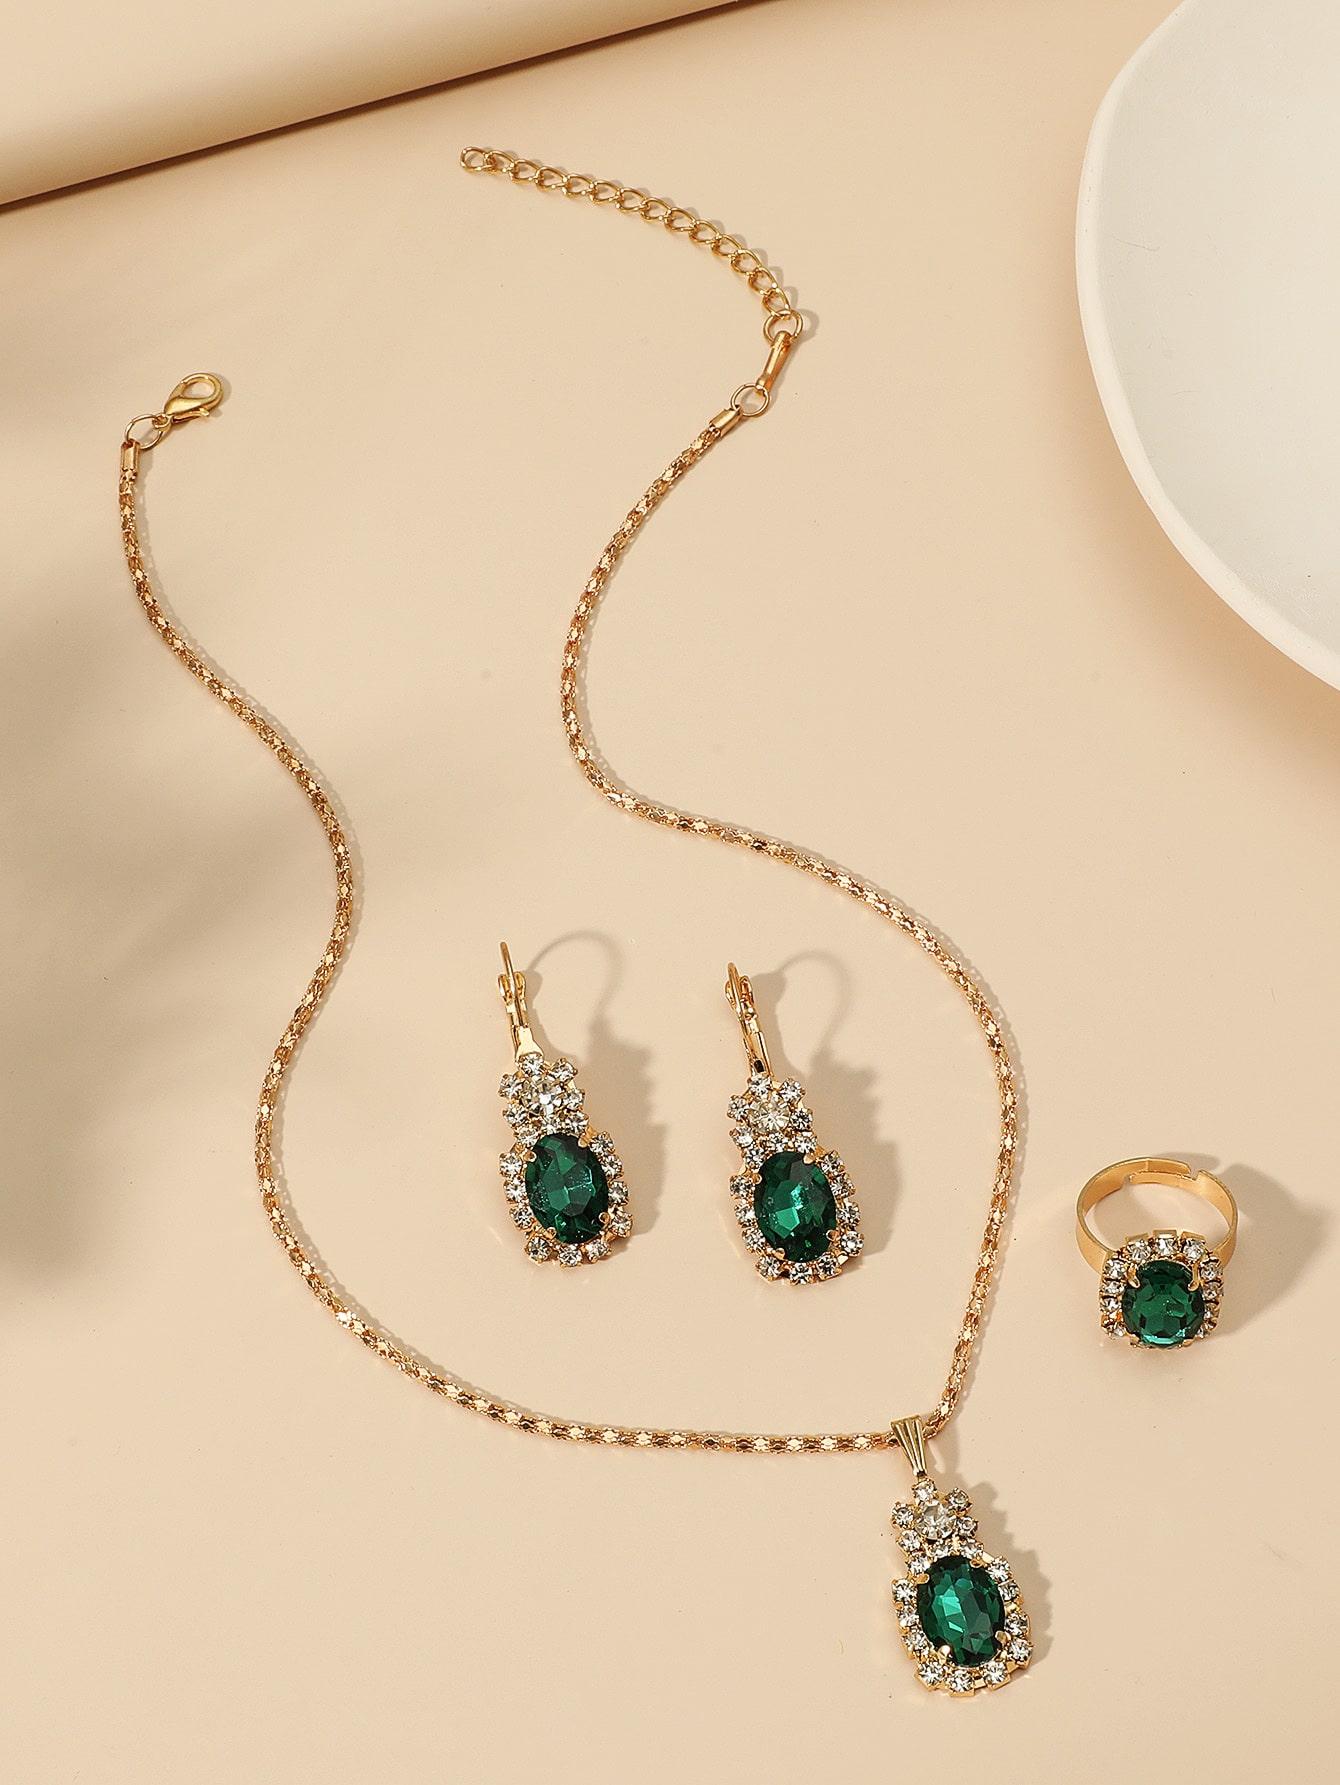 4pcs Rhinestone Decor Jewelry Set thumbnail